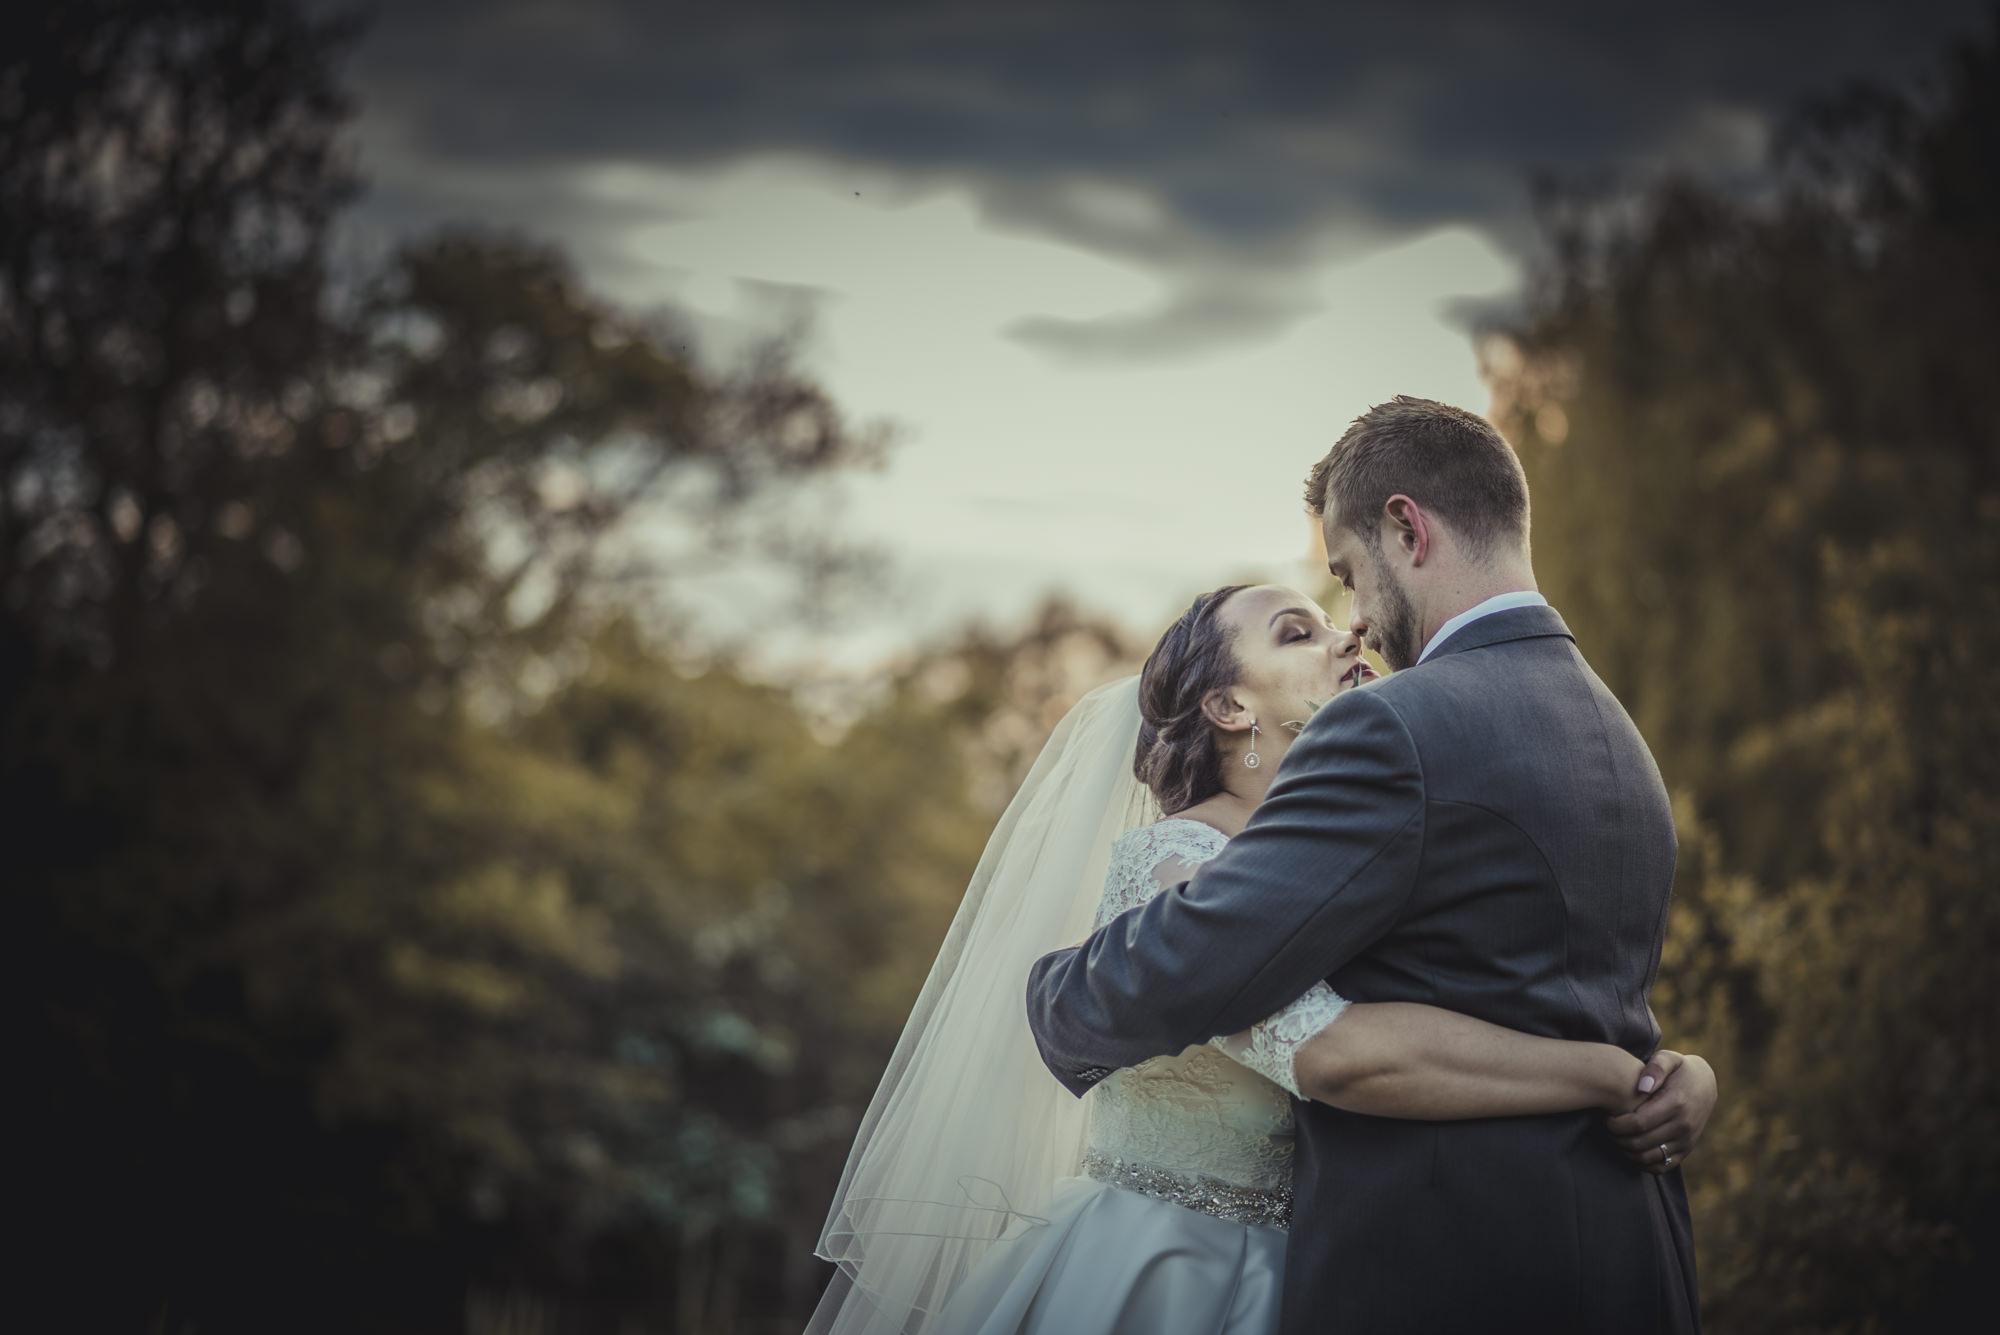 Jacqueline-Gareth-Wedding-Westmead-Events-Surrey-Manu-Mendoza-Wedding-Photography-483.jpg